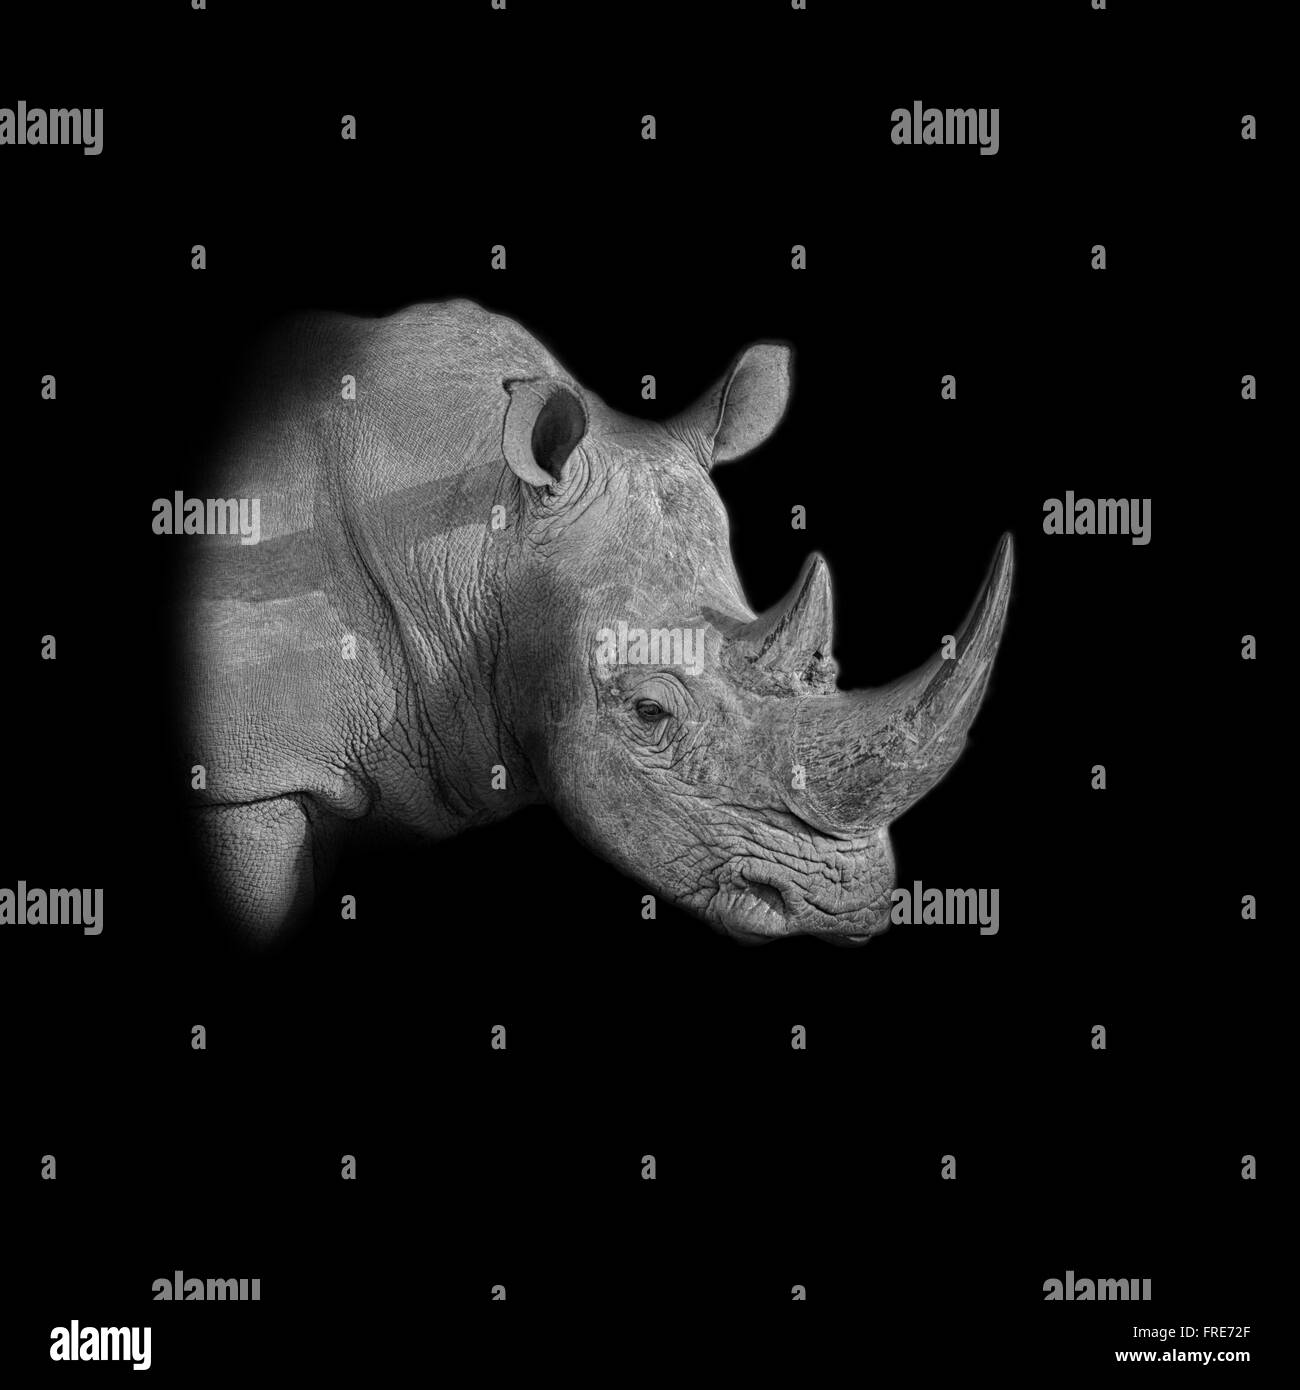 A dark monochrome portrait of a White Rhinoceros - Stock Image